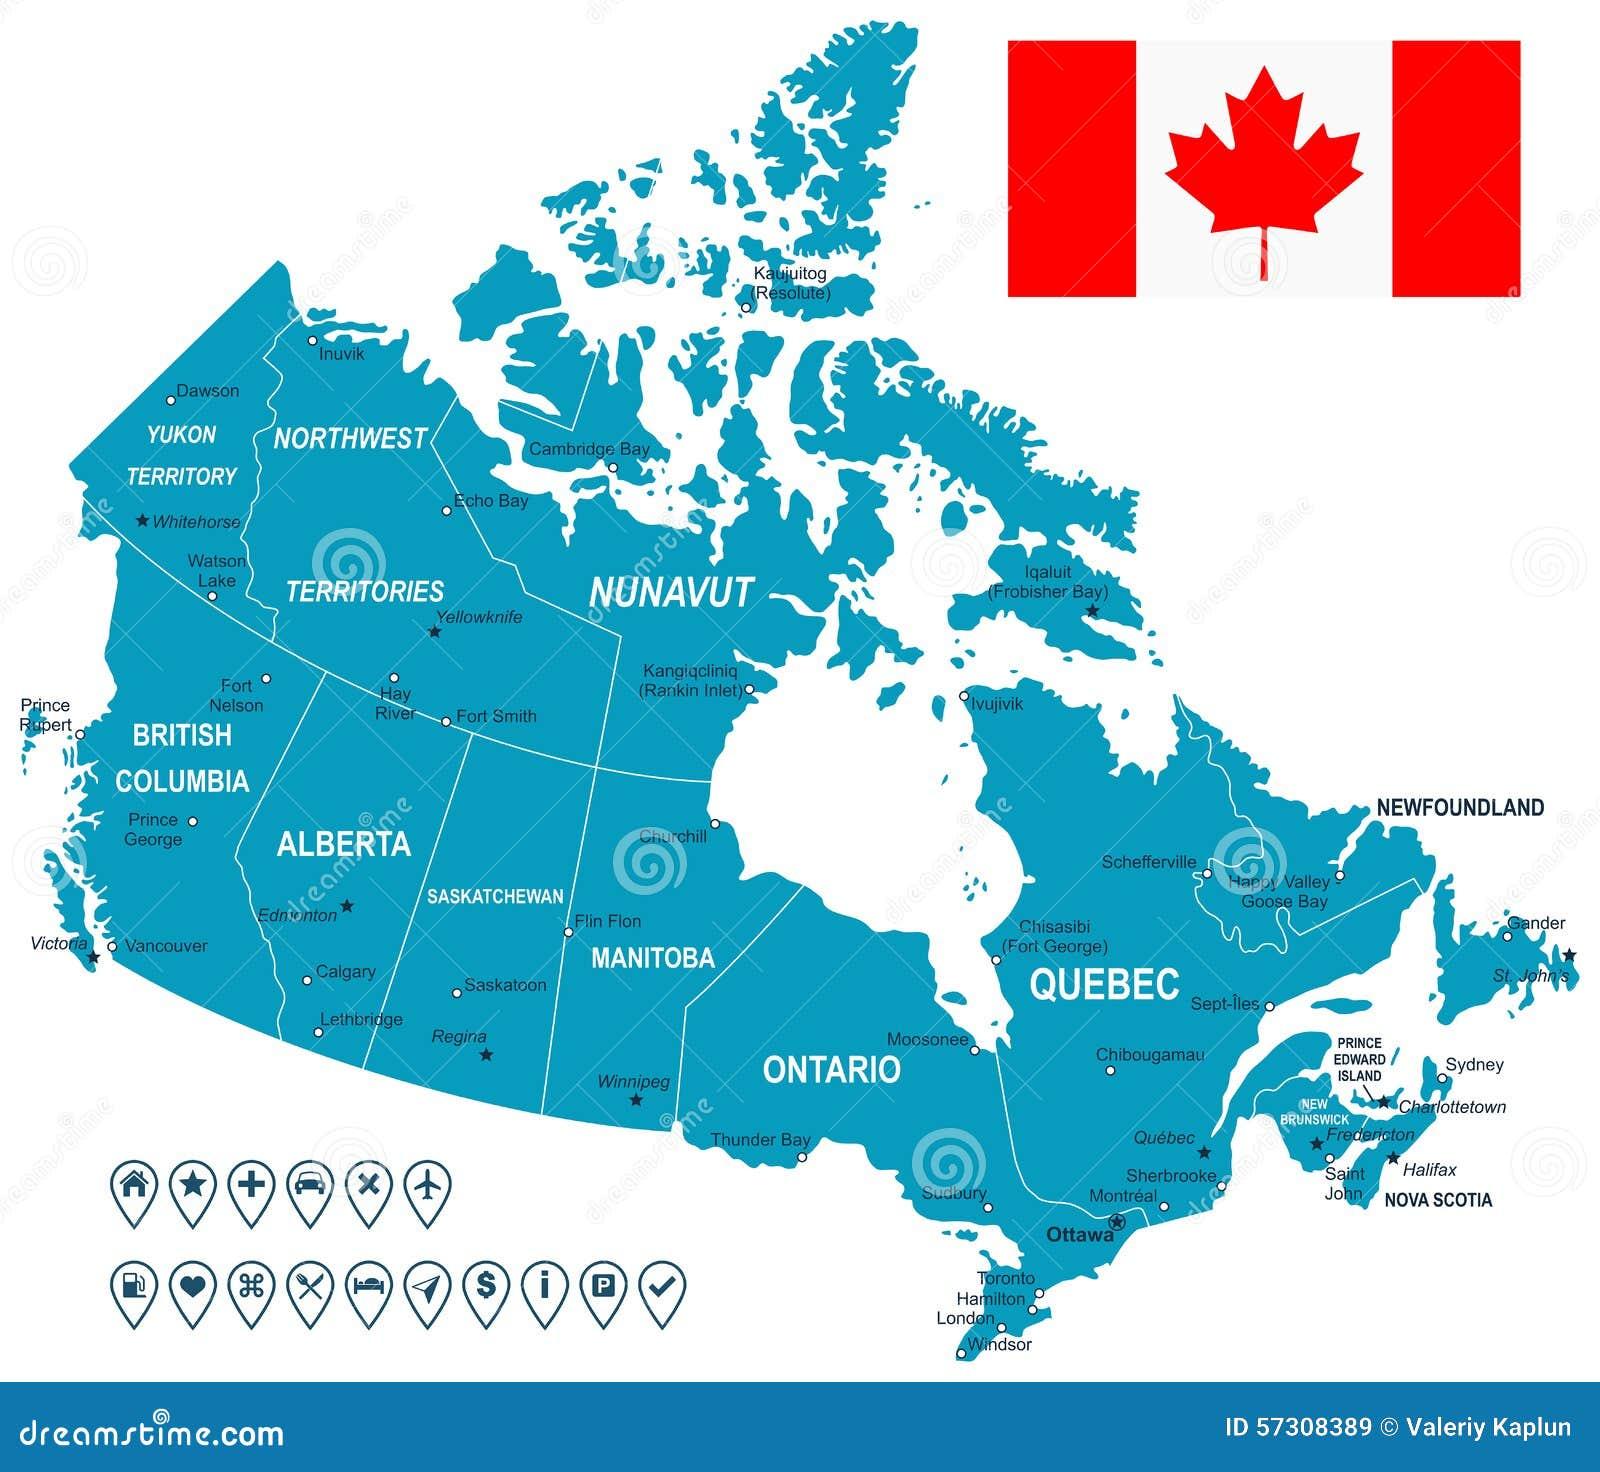 Kanada karte flagge und navigationsaufkleber illustration vektor